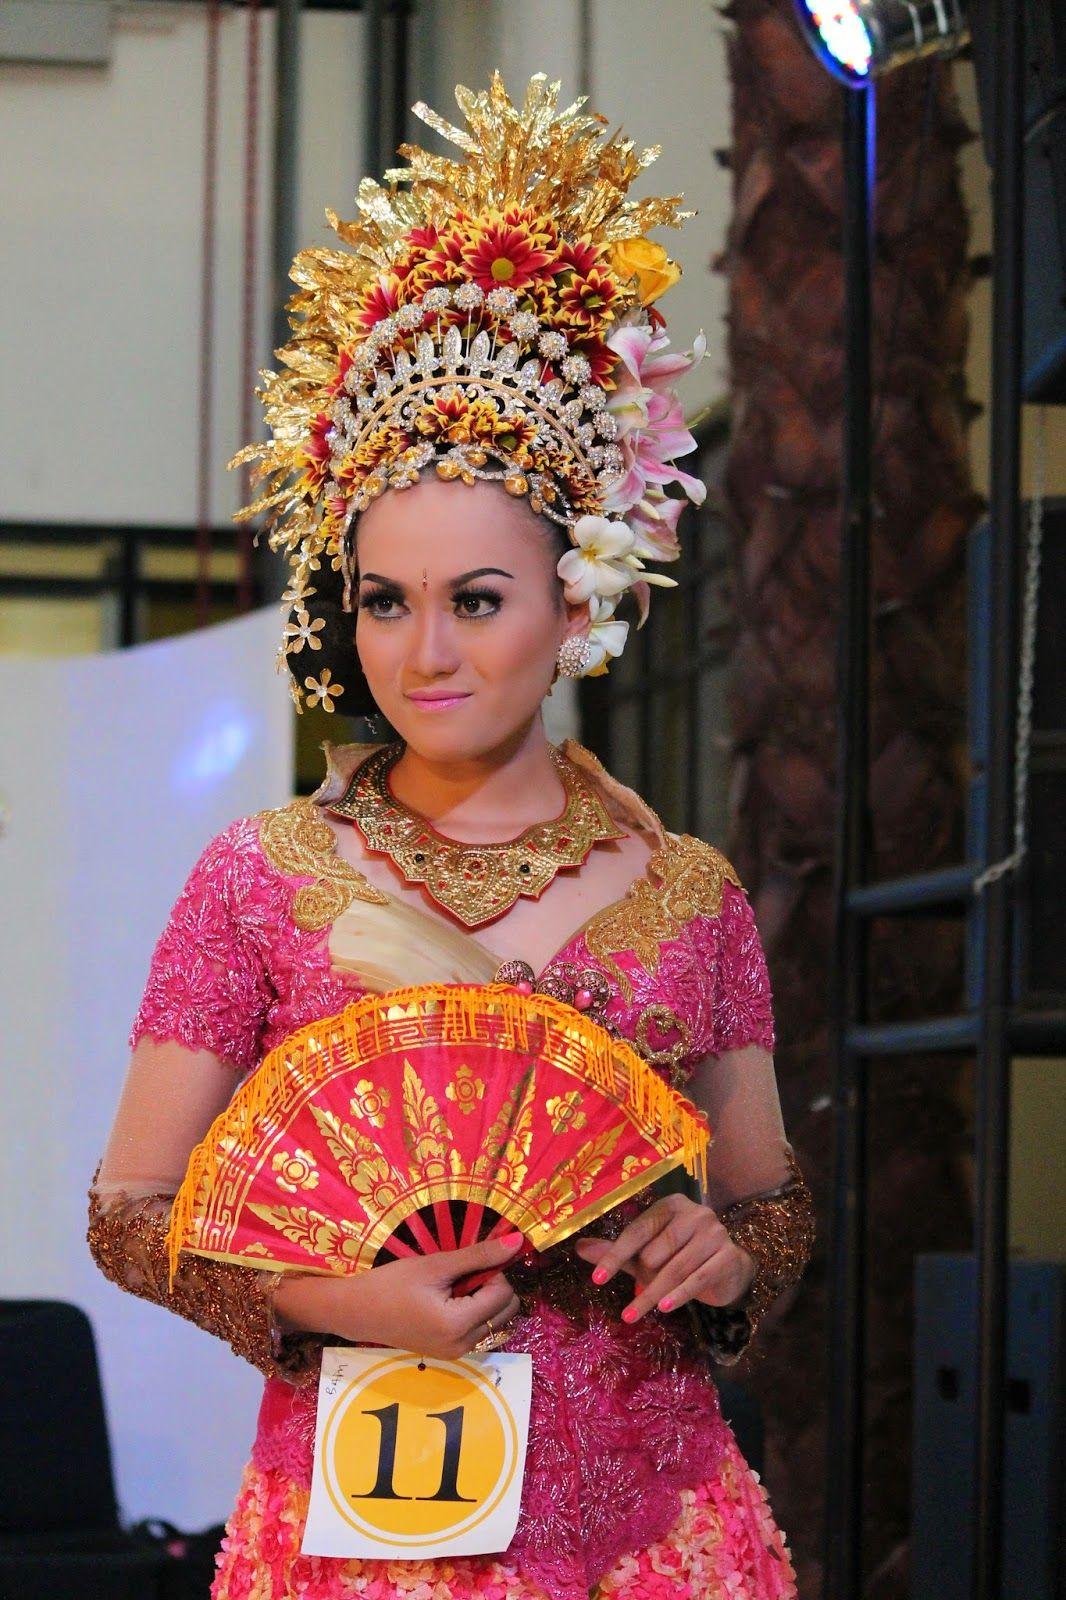 Gambar Pahlawan Yang Berasal Dari Jawa Barat